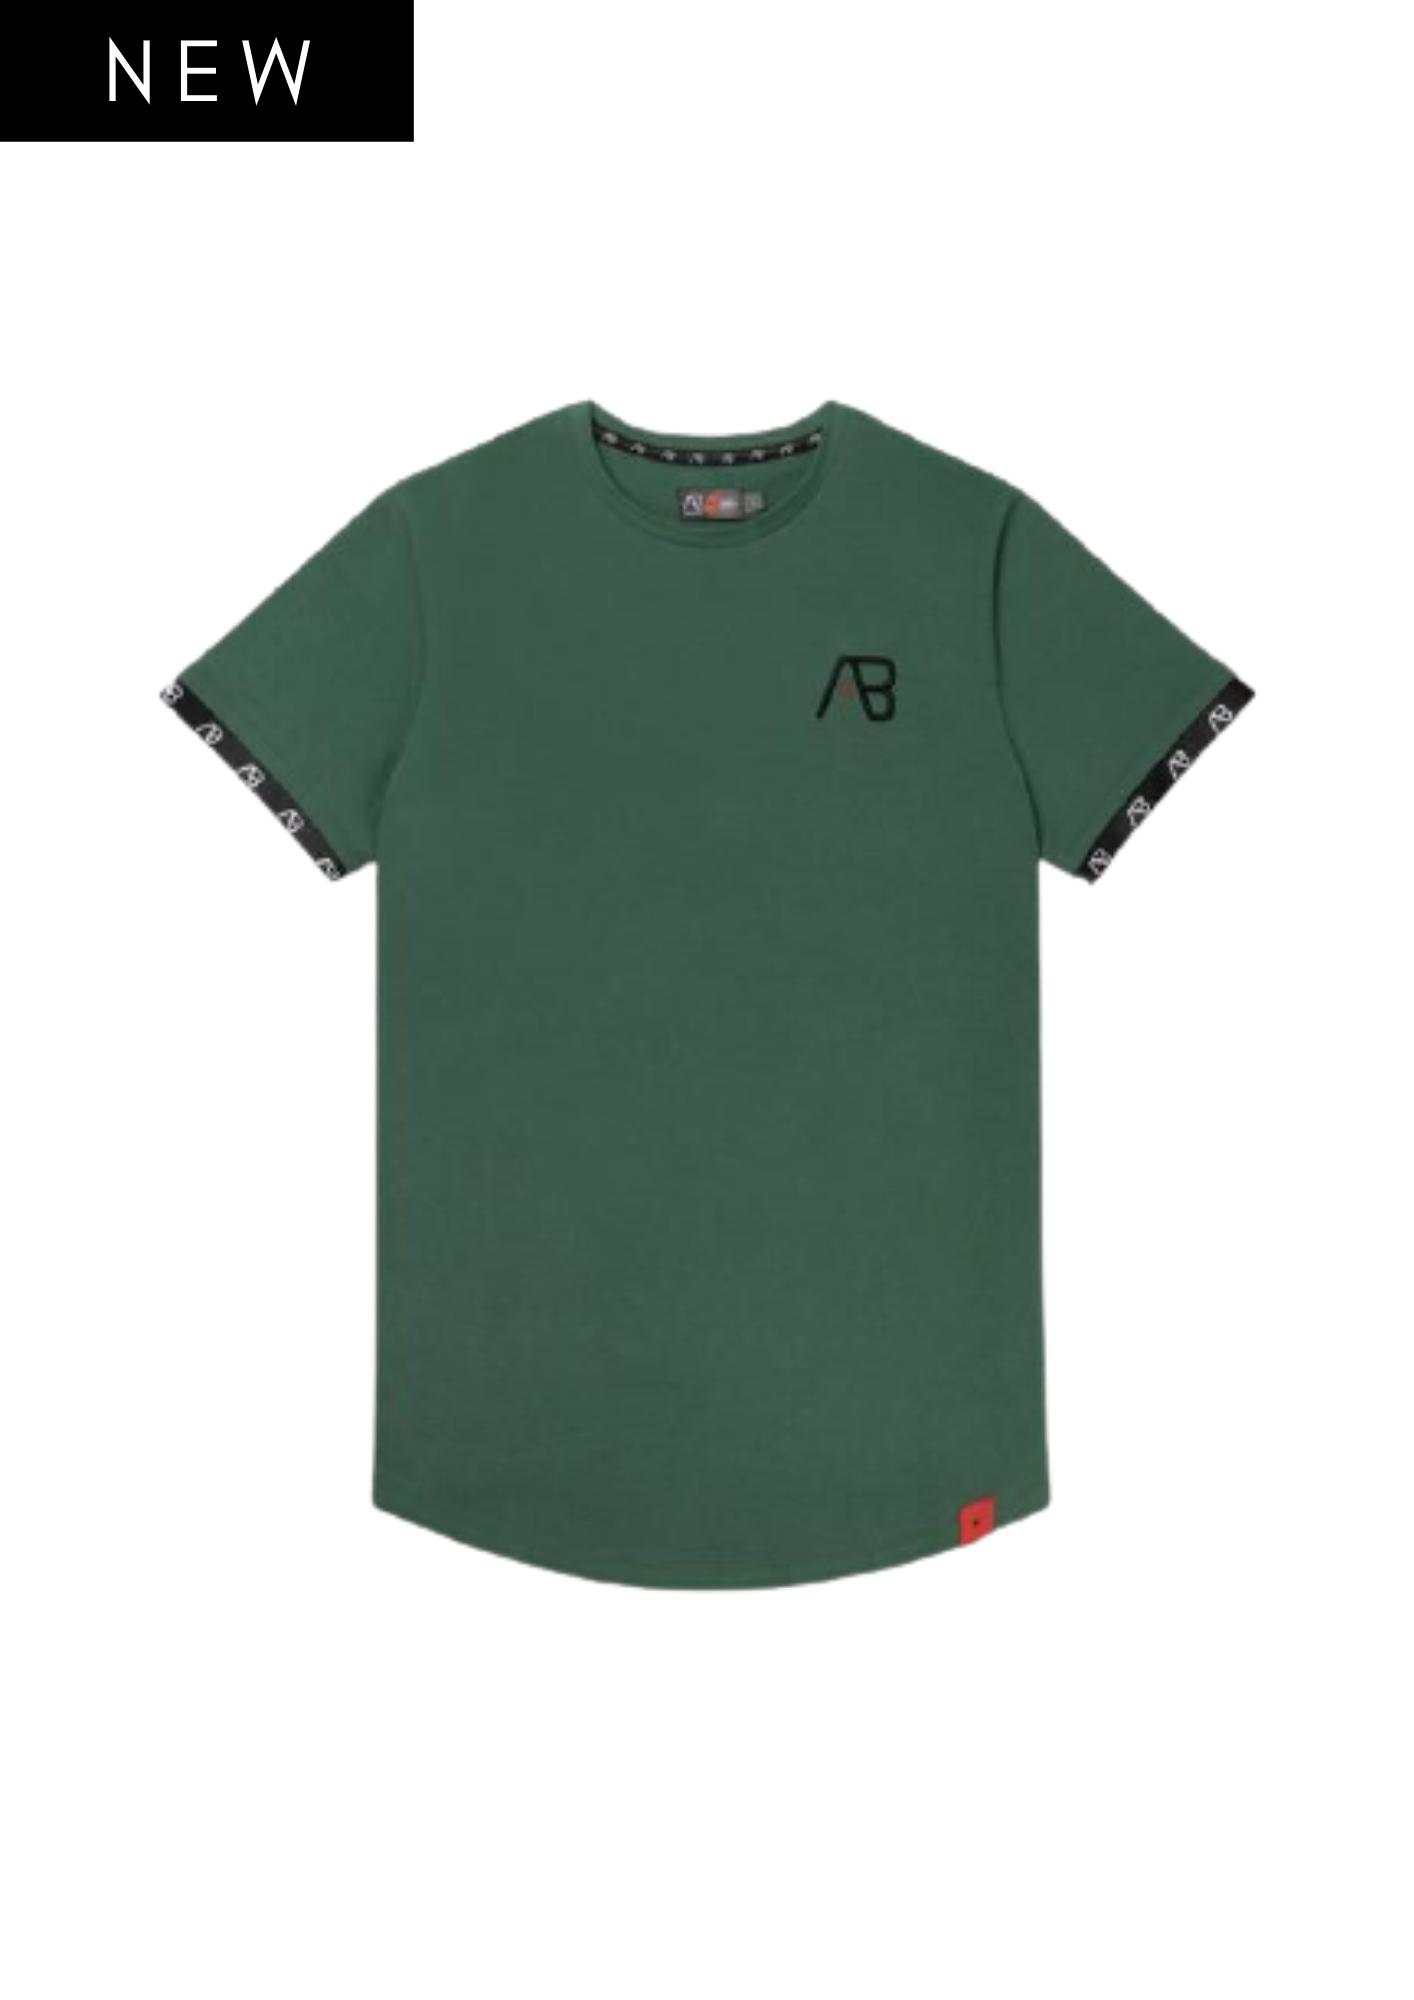 Flag Tee - Turtle Green